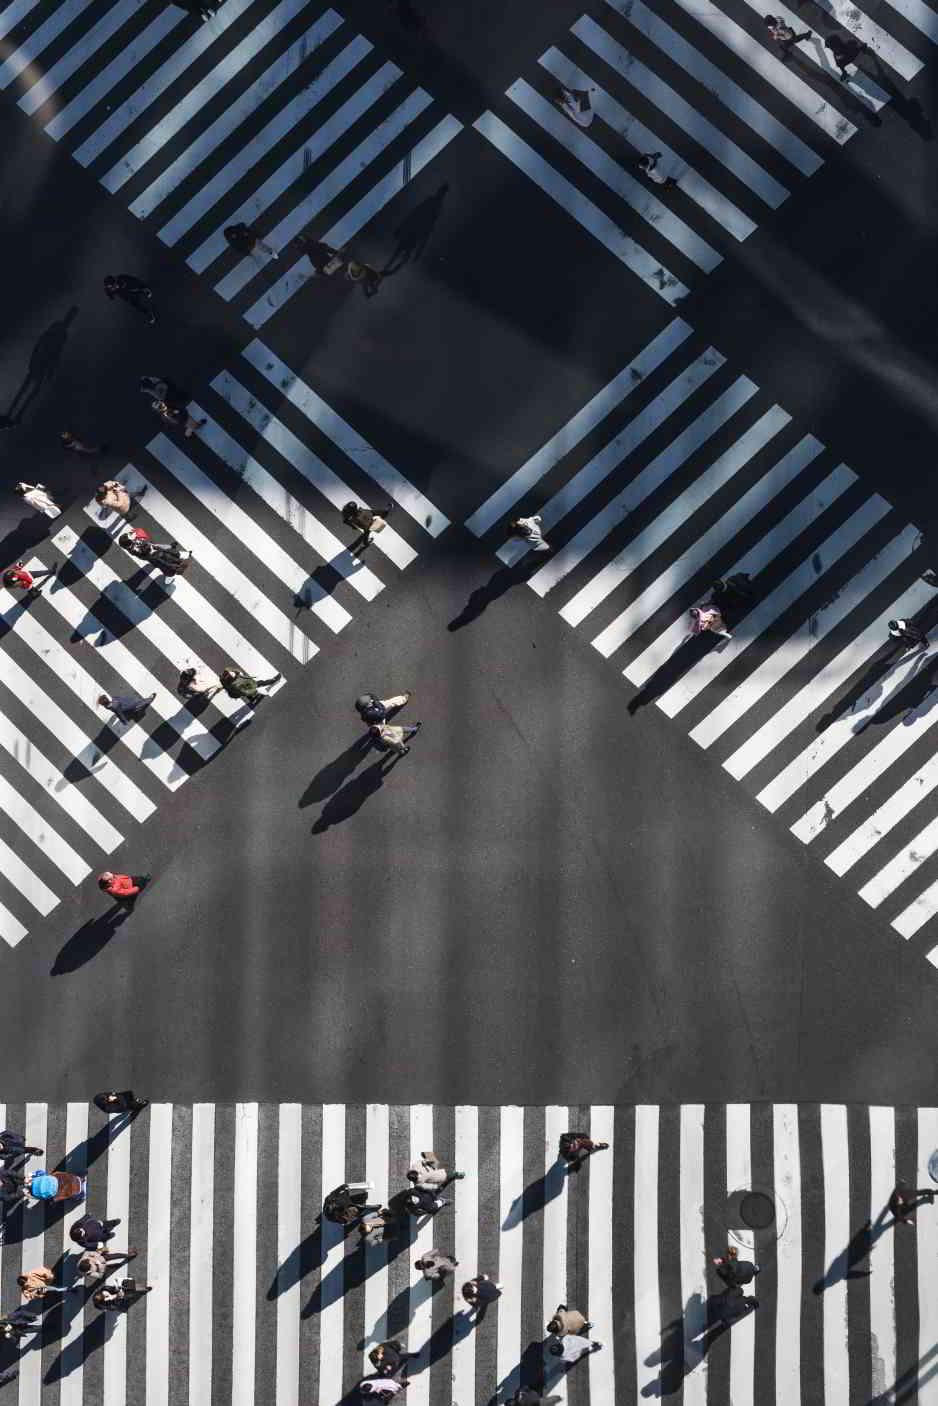 Psicología senda peatonal cruce tránsito